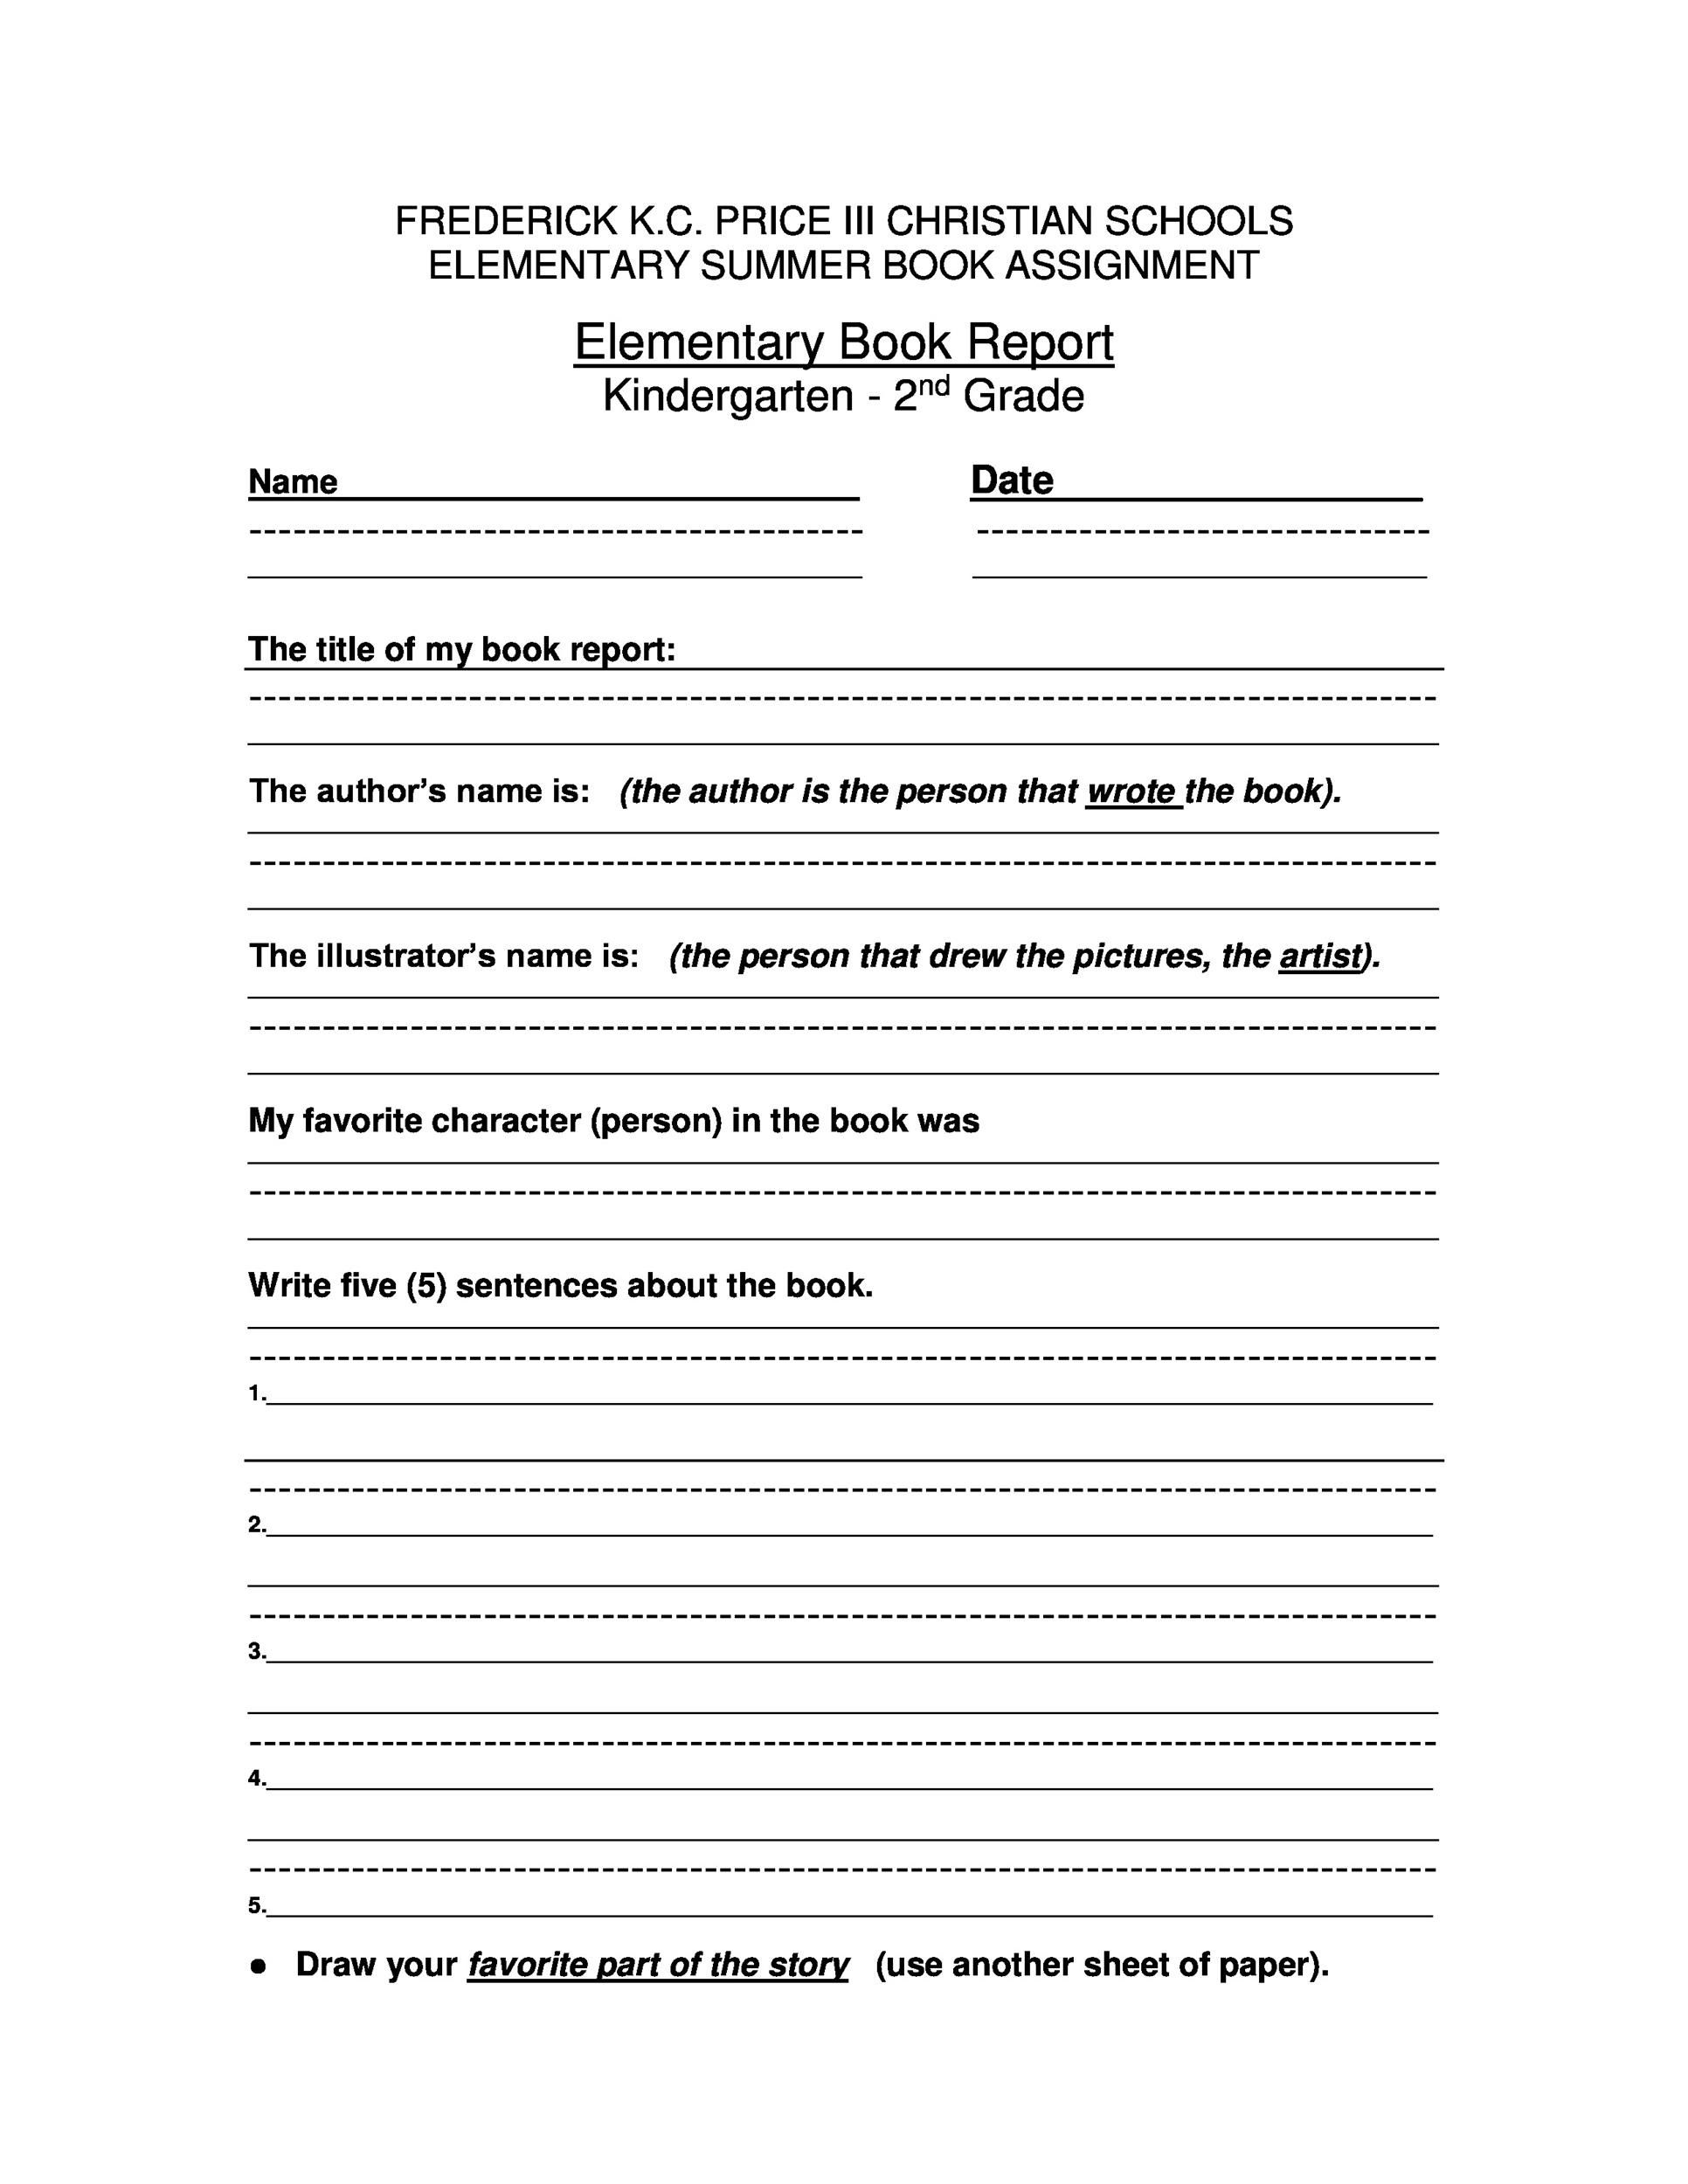 003 Surprising Blank Book Report Form 6th Grade Design  Free Printable TemplateFull